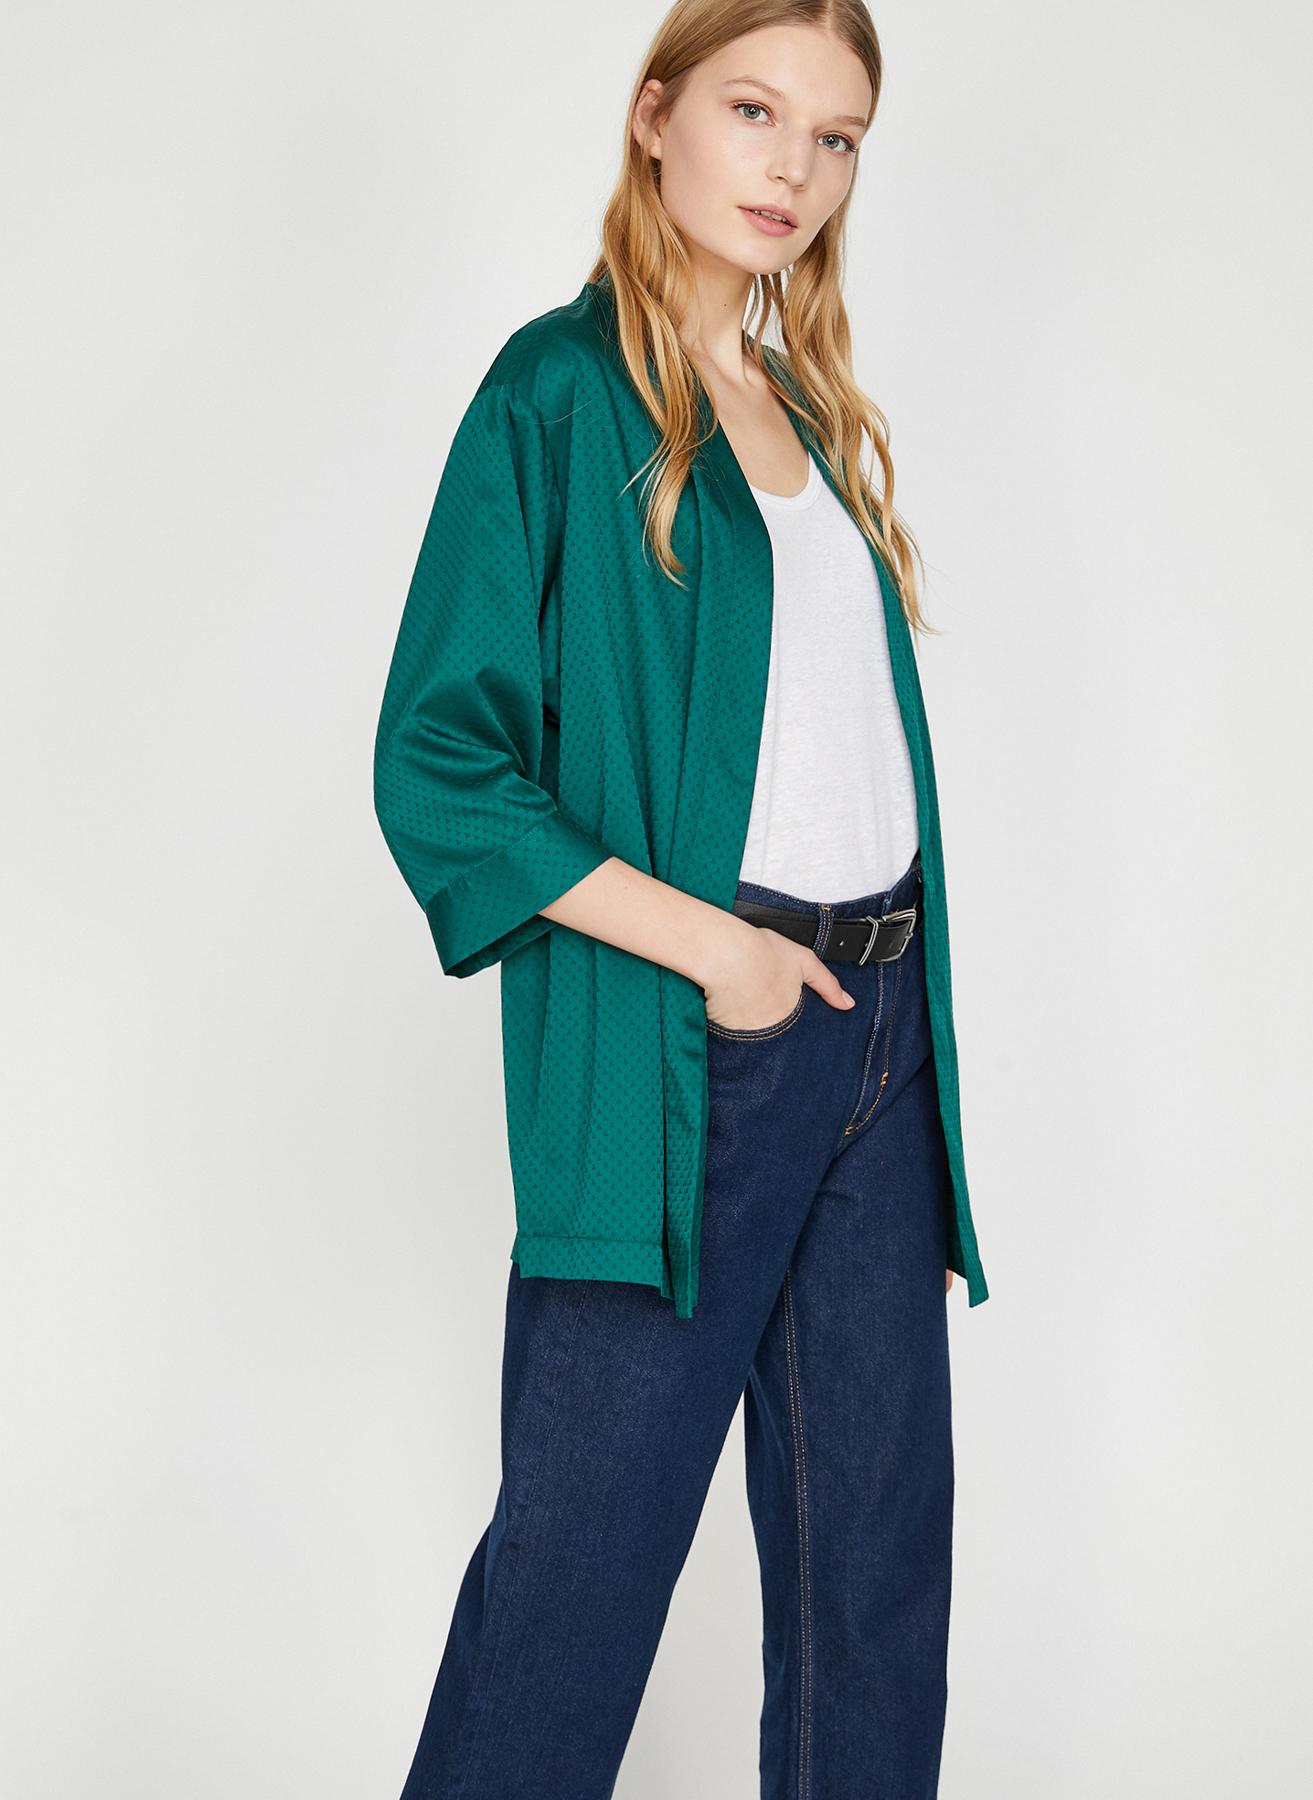 a5d8ac3c65b33 34 Koyu Yeşil Koton Kimono 5002369657001 Kadın Dış Giyim Trençkot & Pardösü